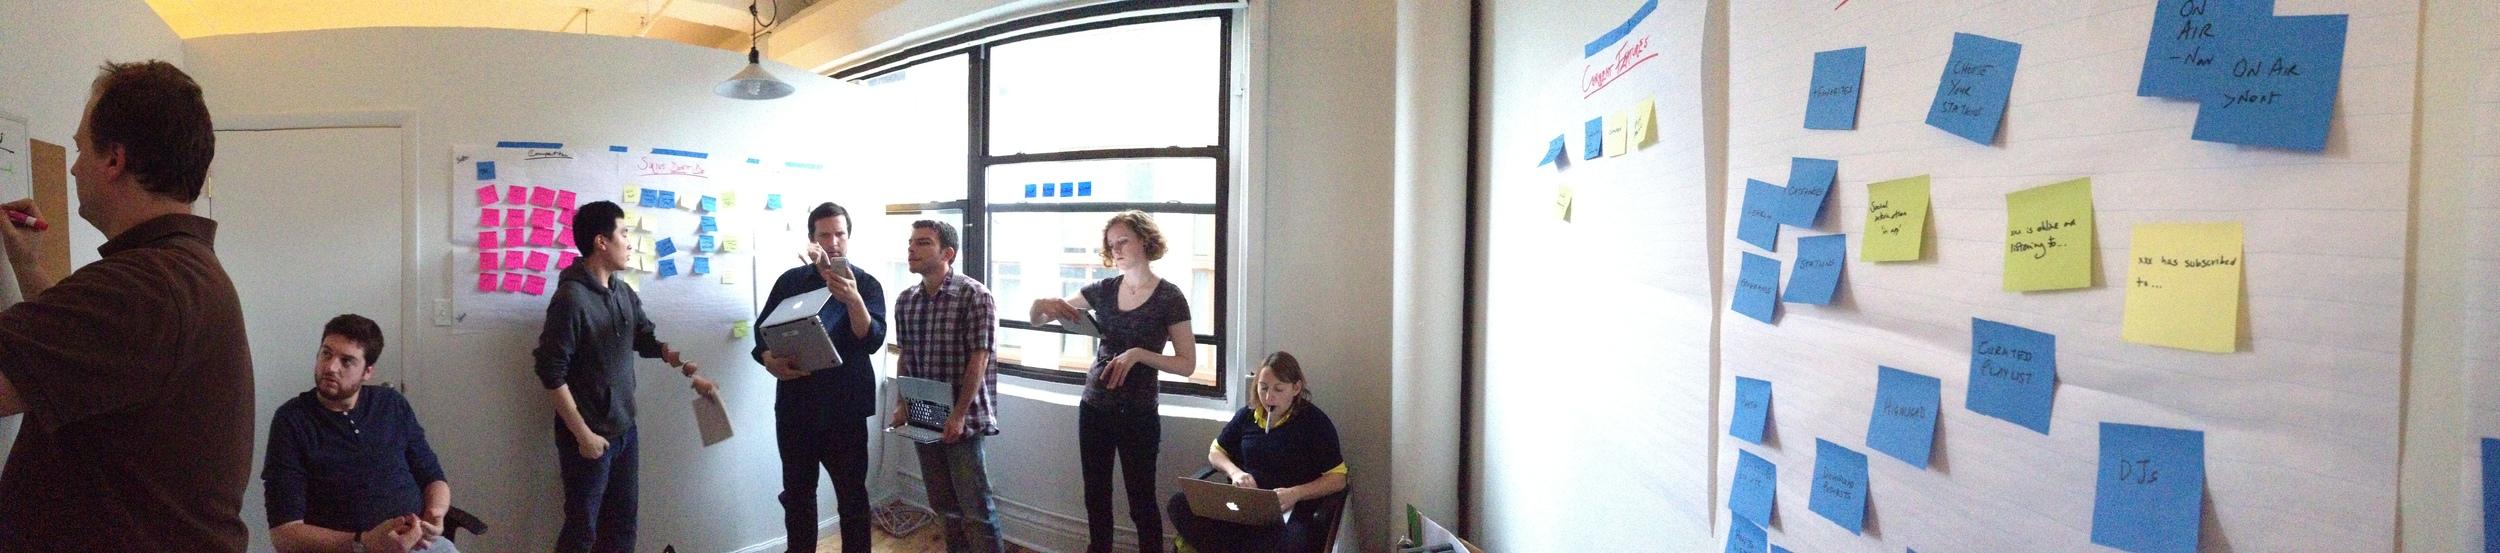 Team Brainstorm with Tigerspike